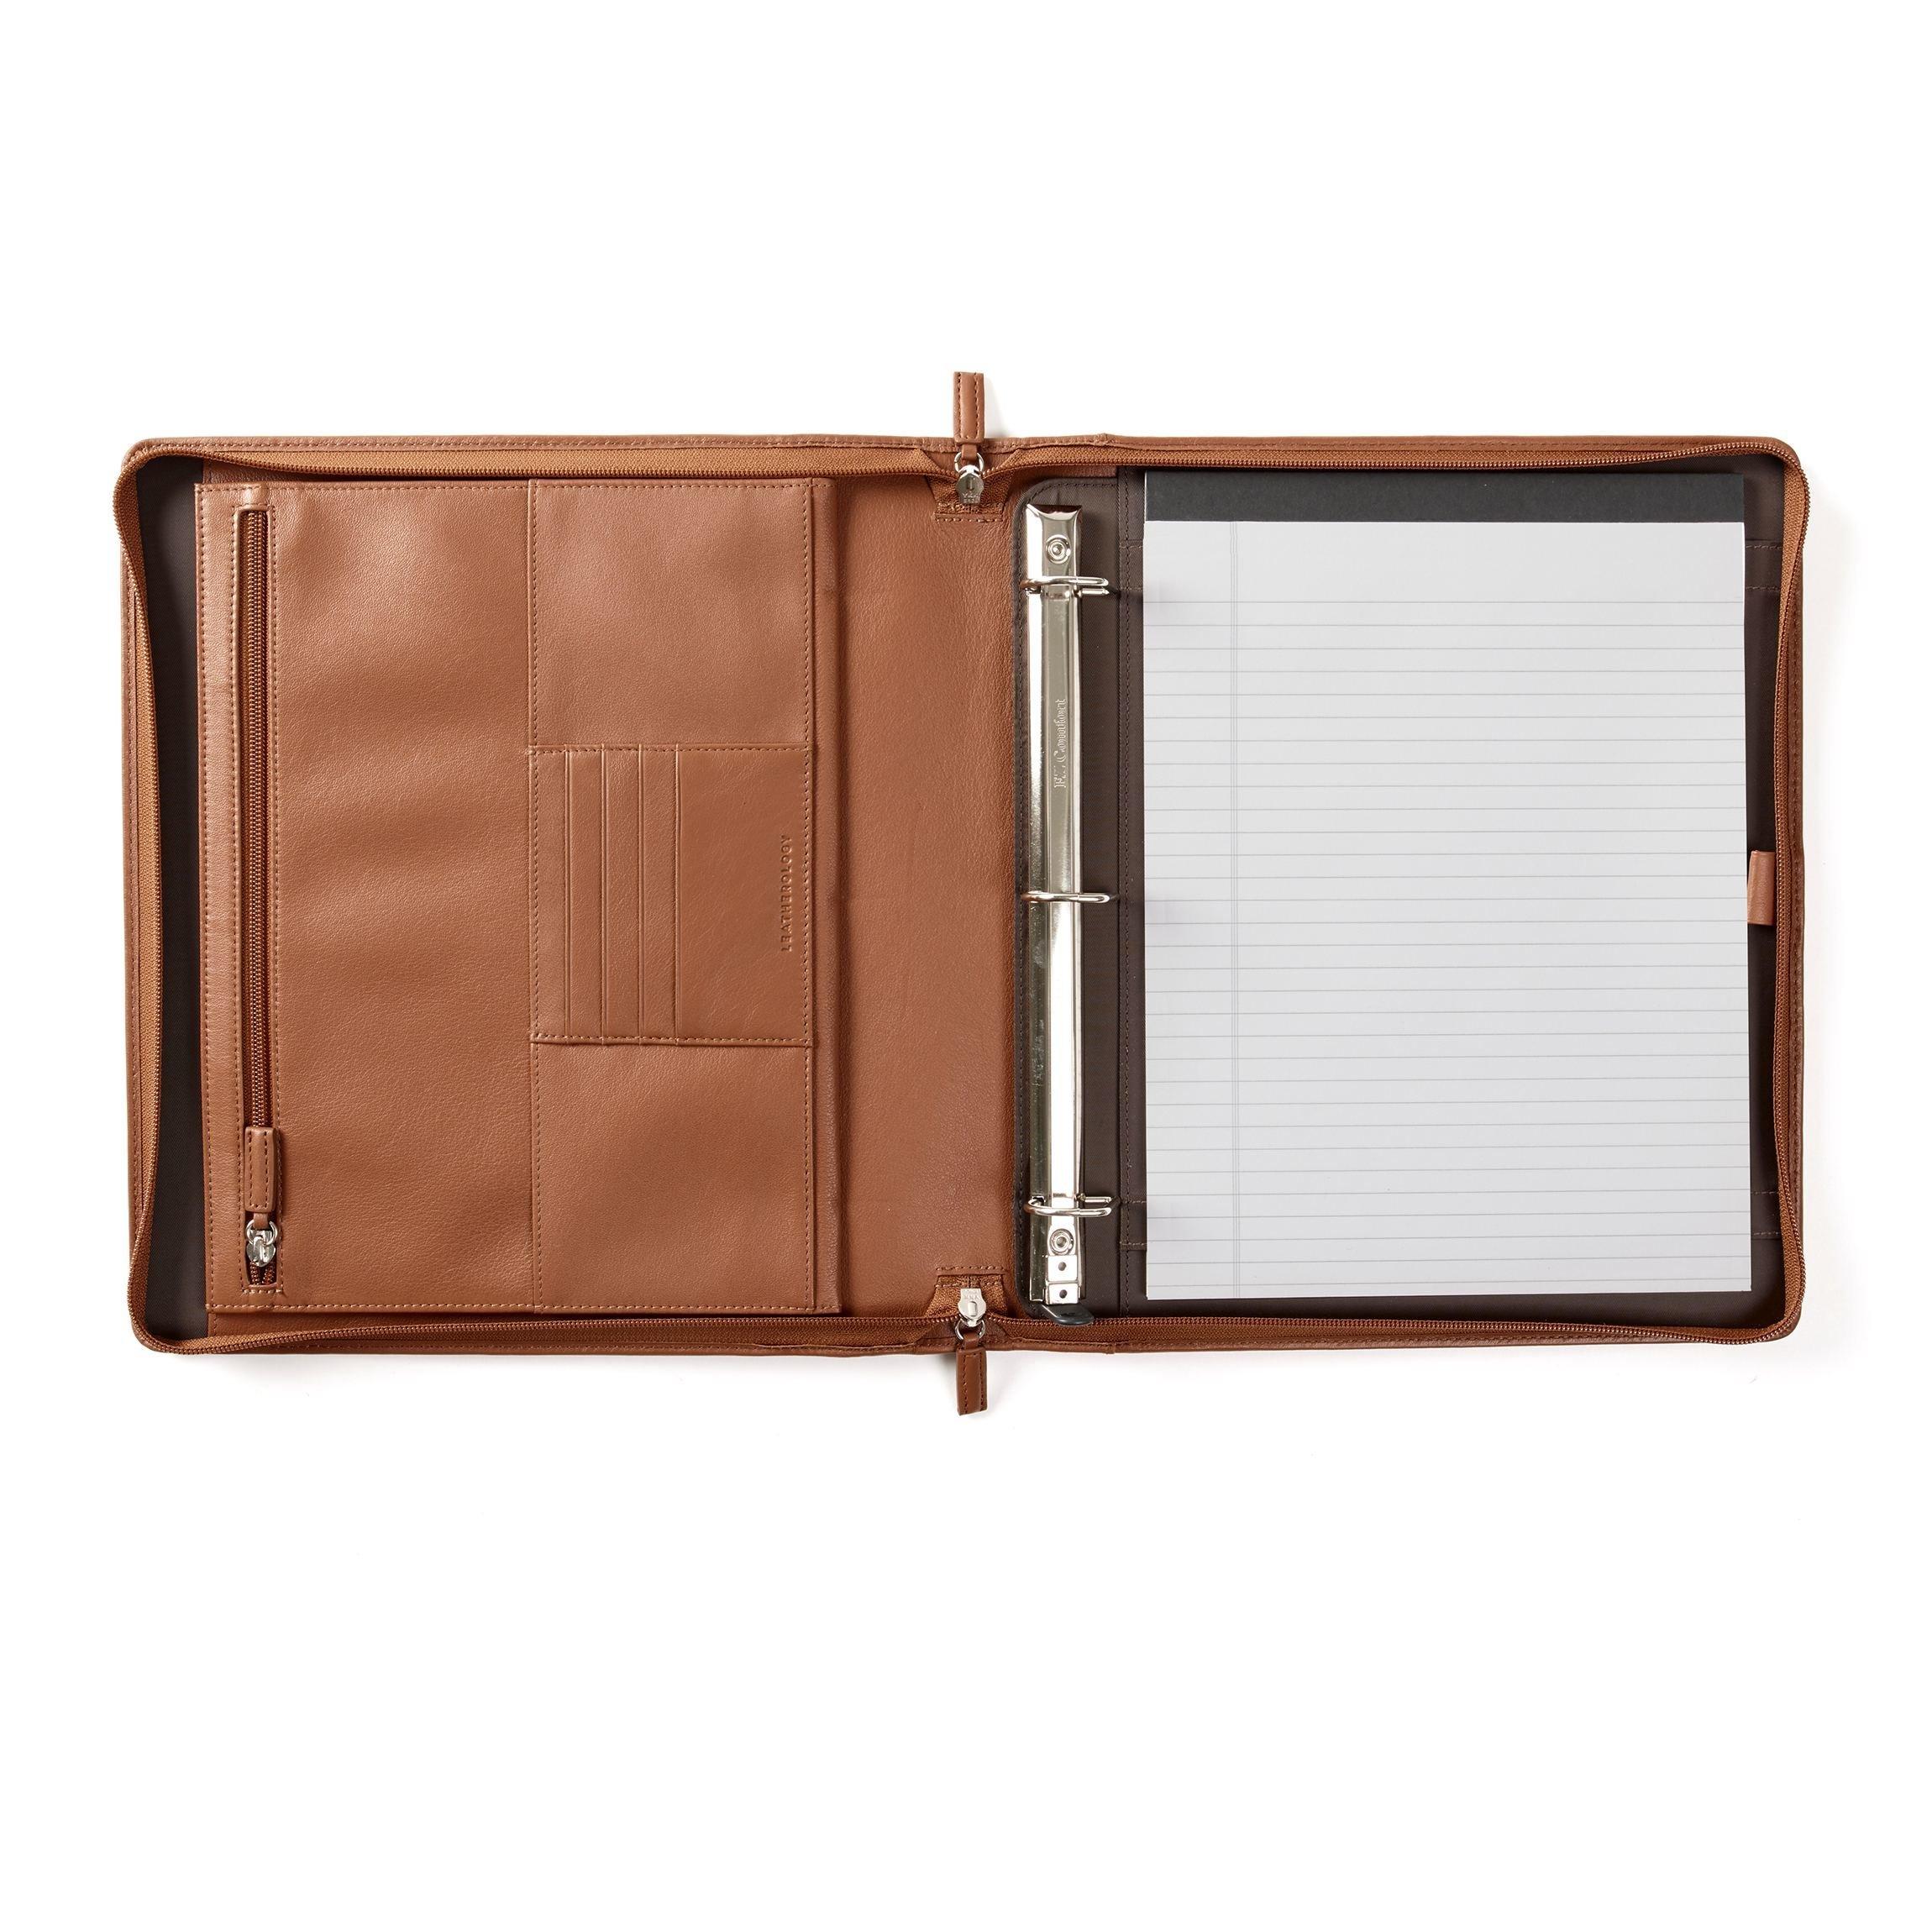 Padfolio Binder - Full Grain Leather - Cognac (brown)